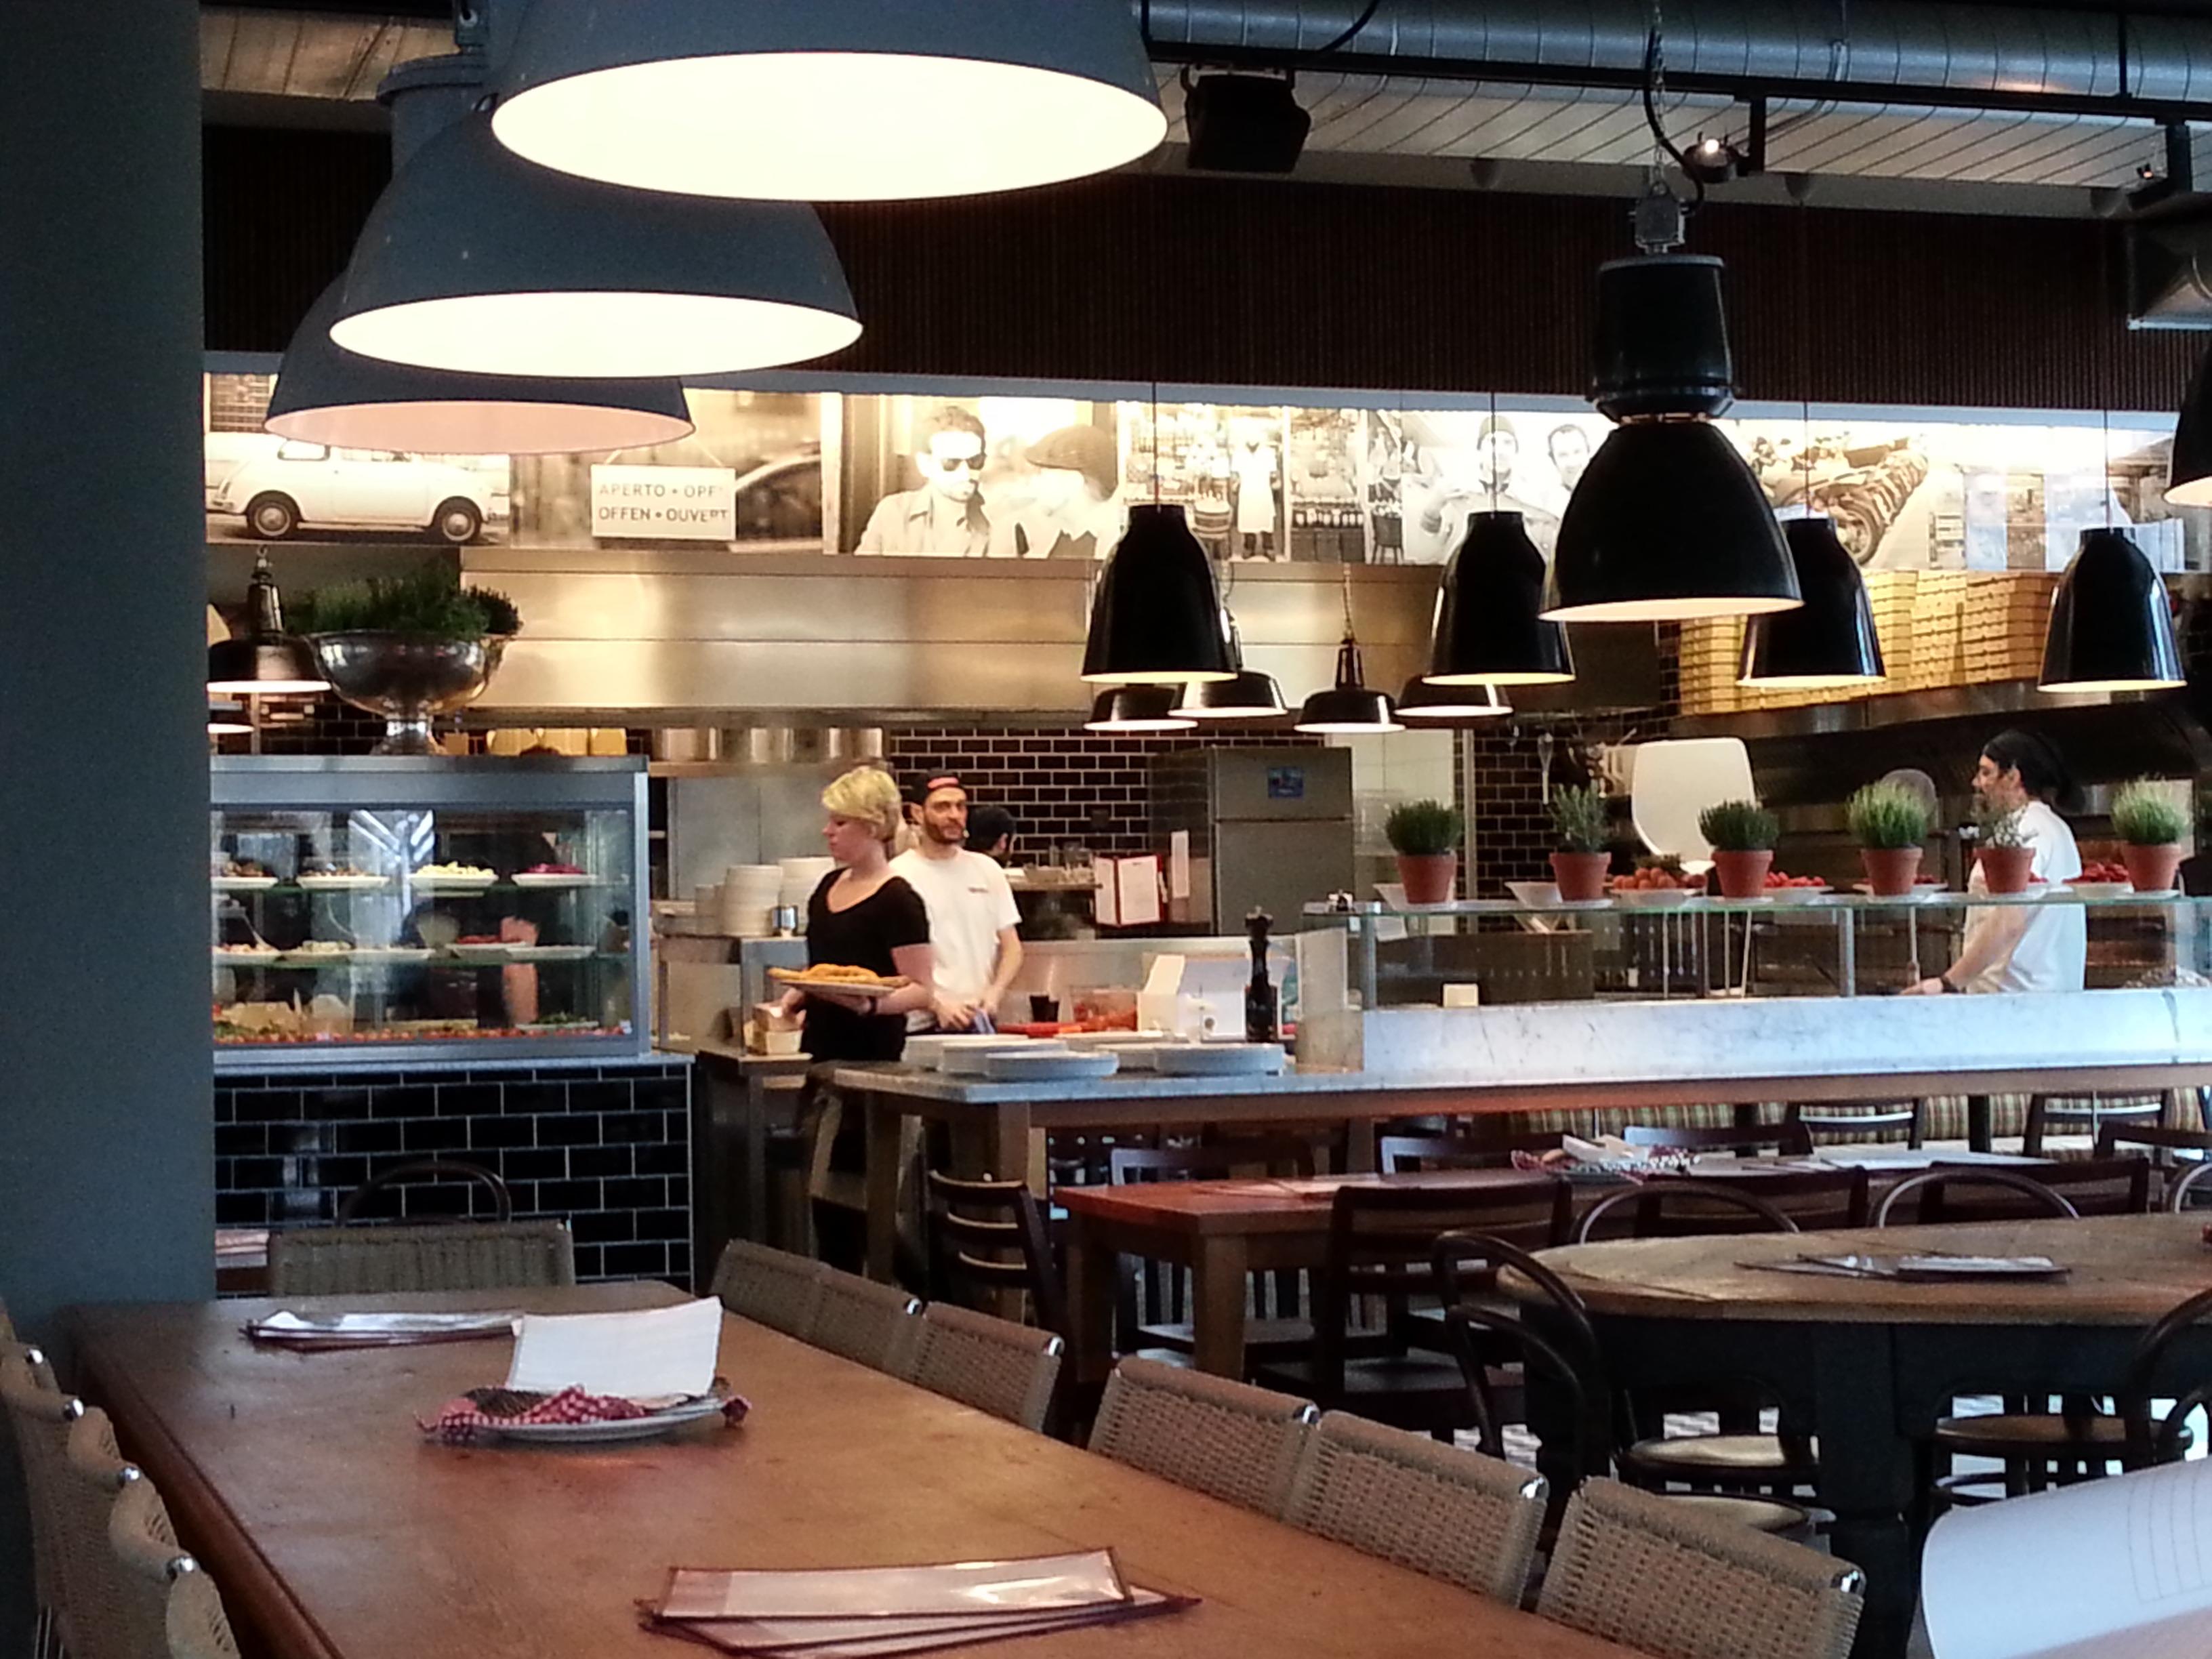 Emejing offene k che restaurant pictures house design for Wohnzimmer cafe dortmund